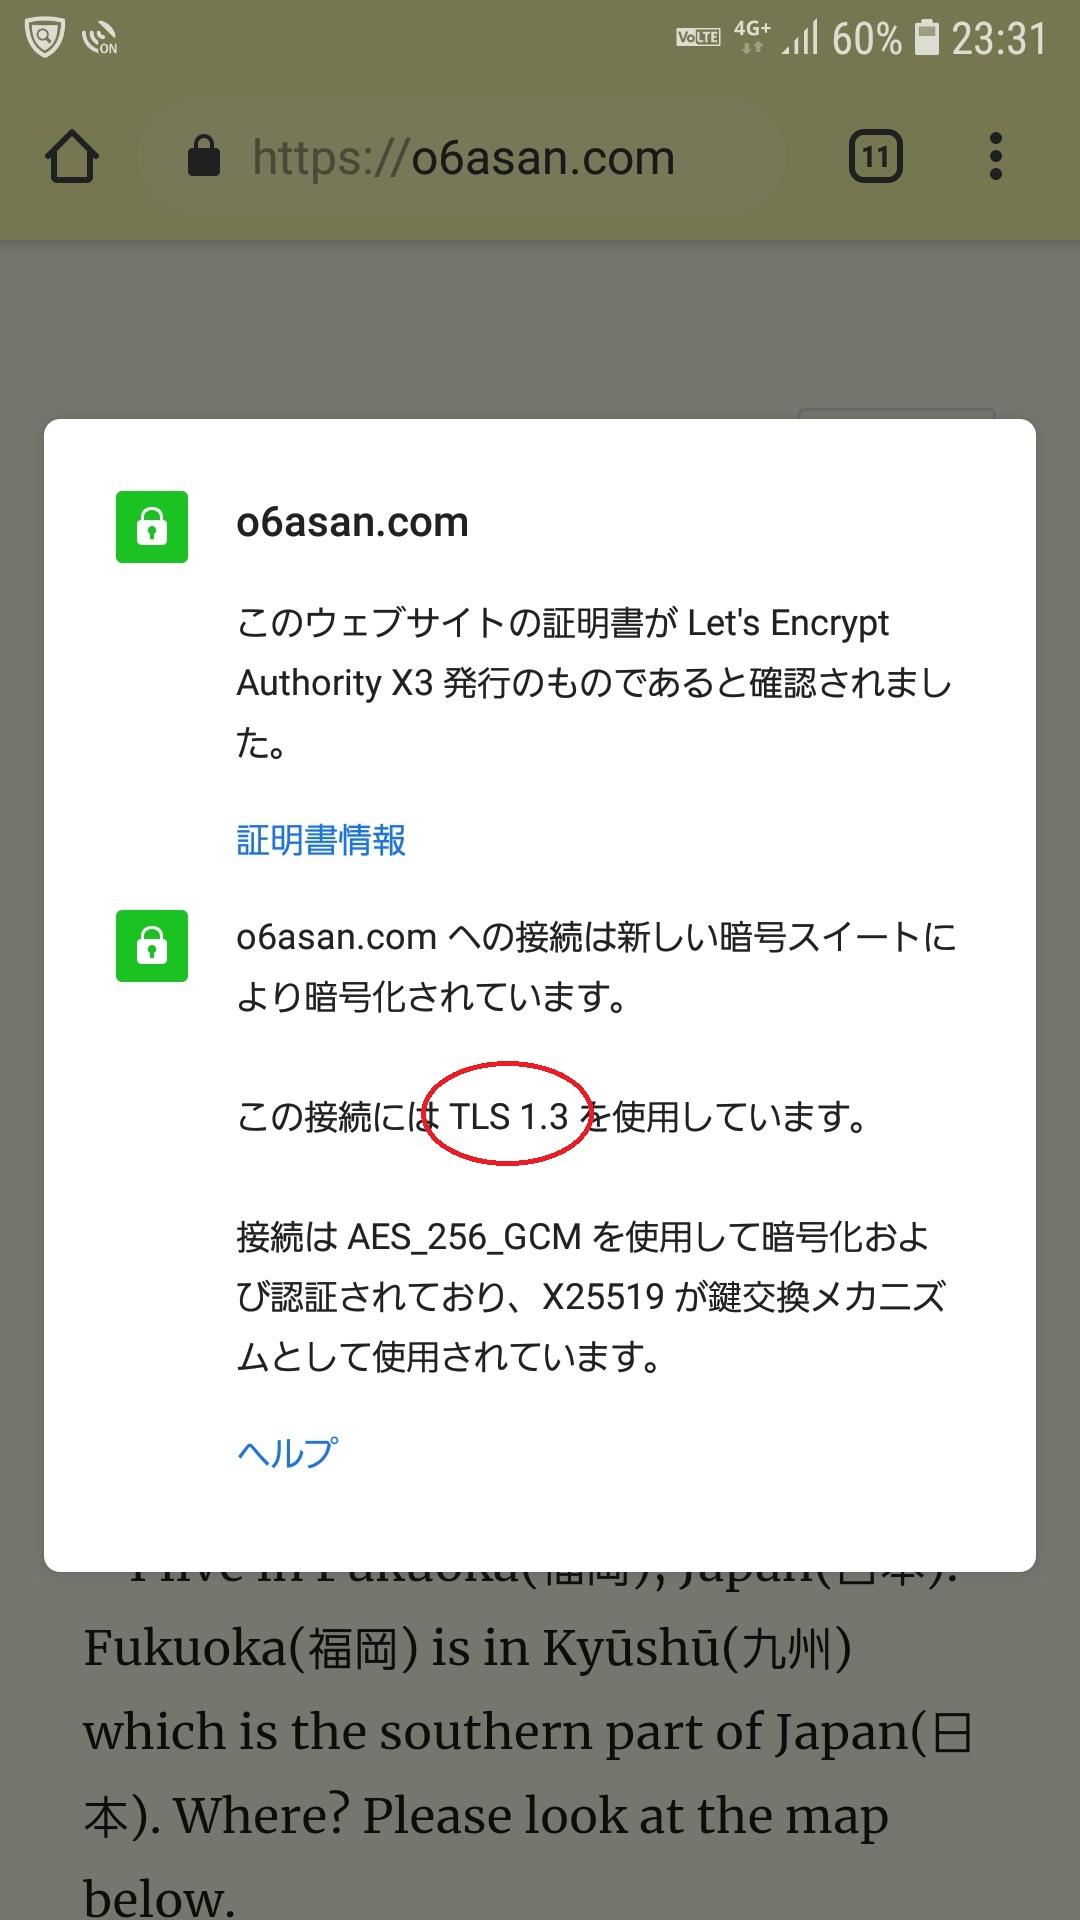 TLSv1.3